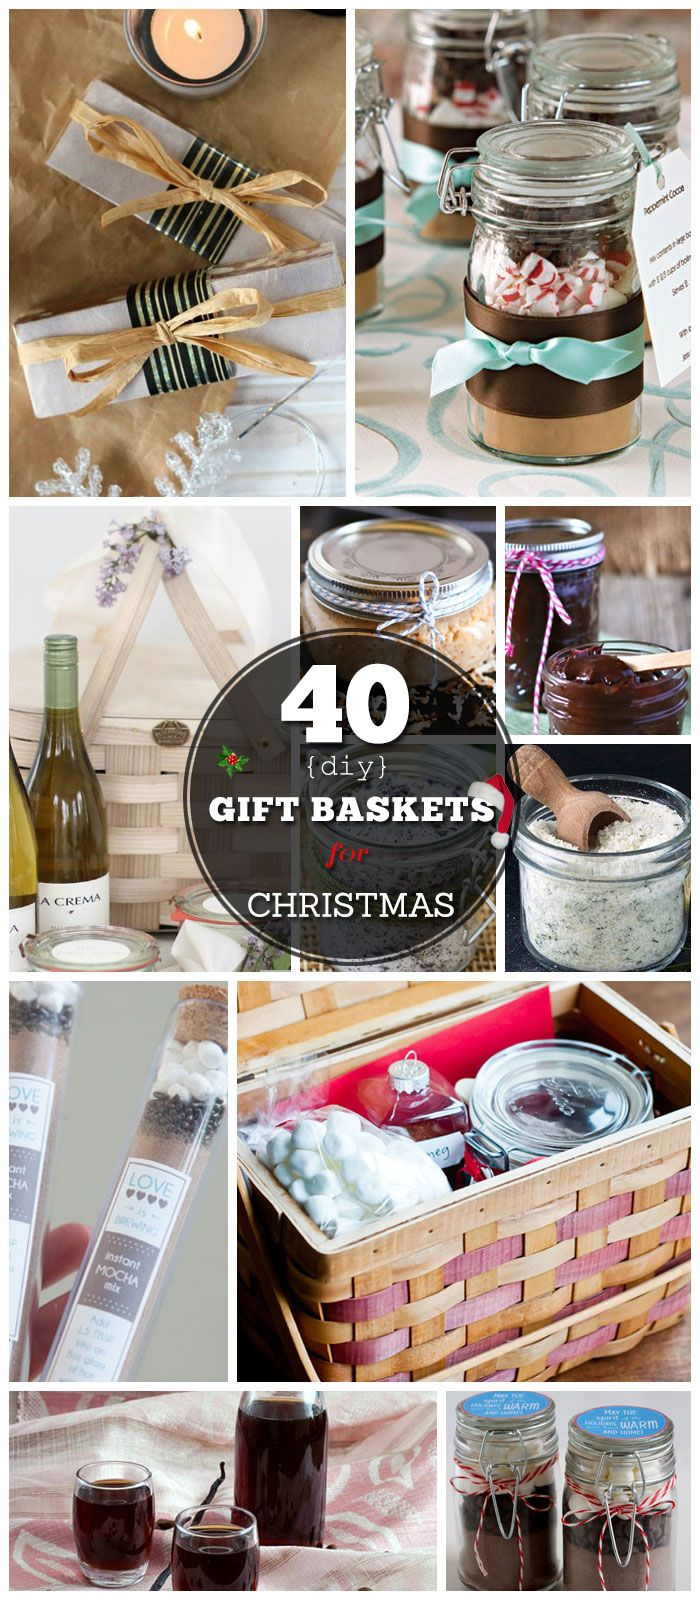 26 DIY Gift Basket Ideas for Christmas | DIY gift ideas | Pinterest ...